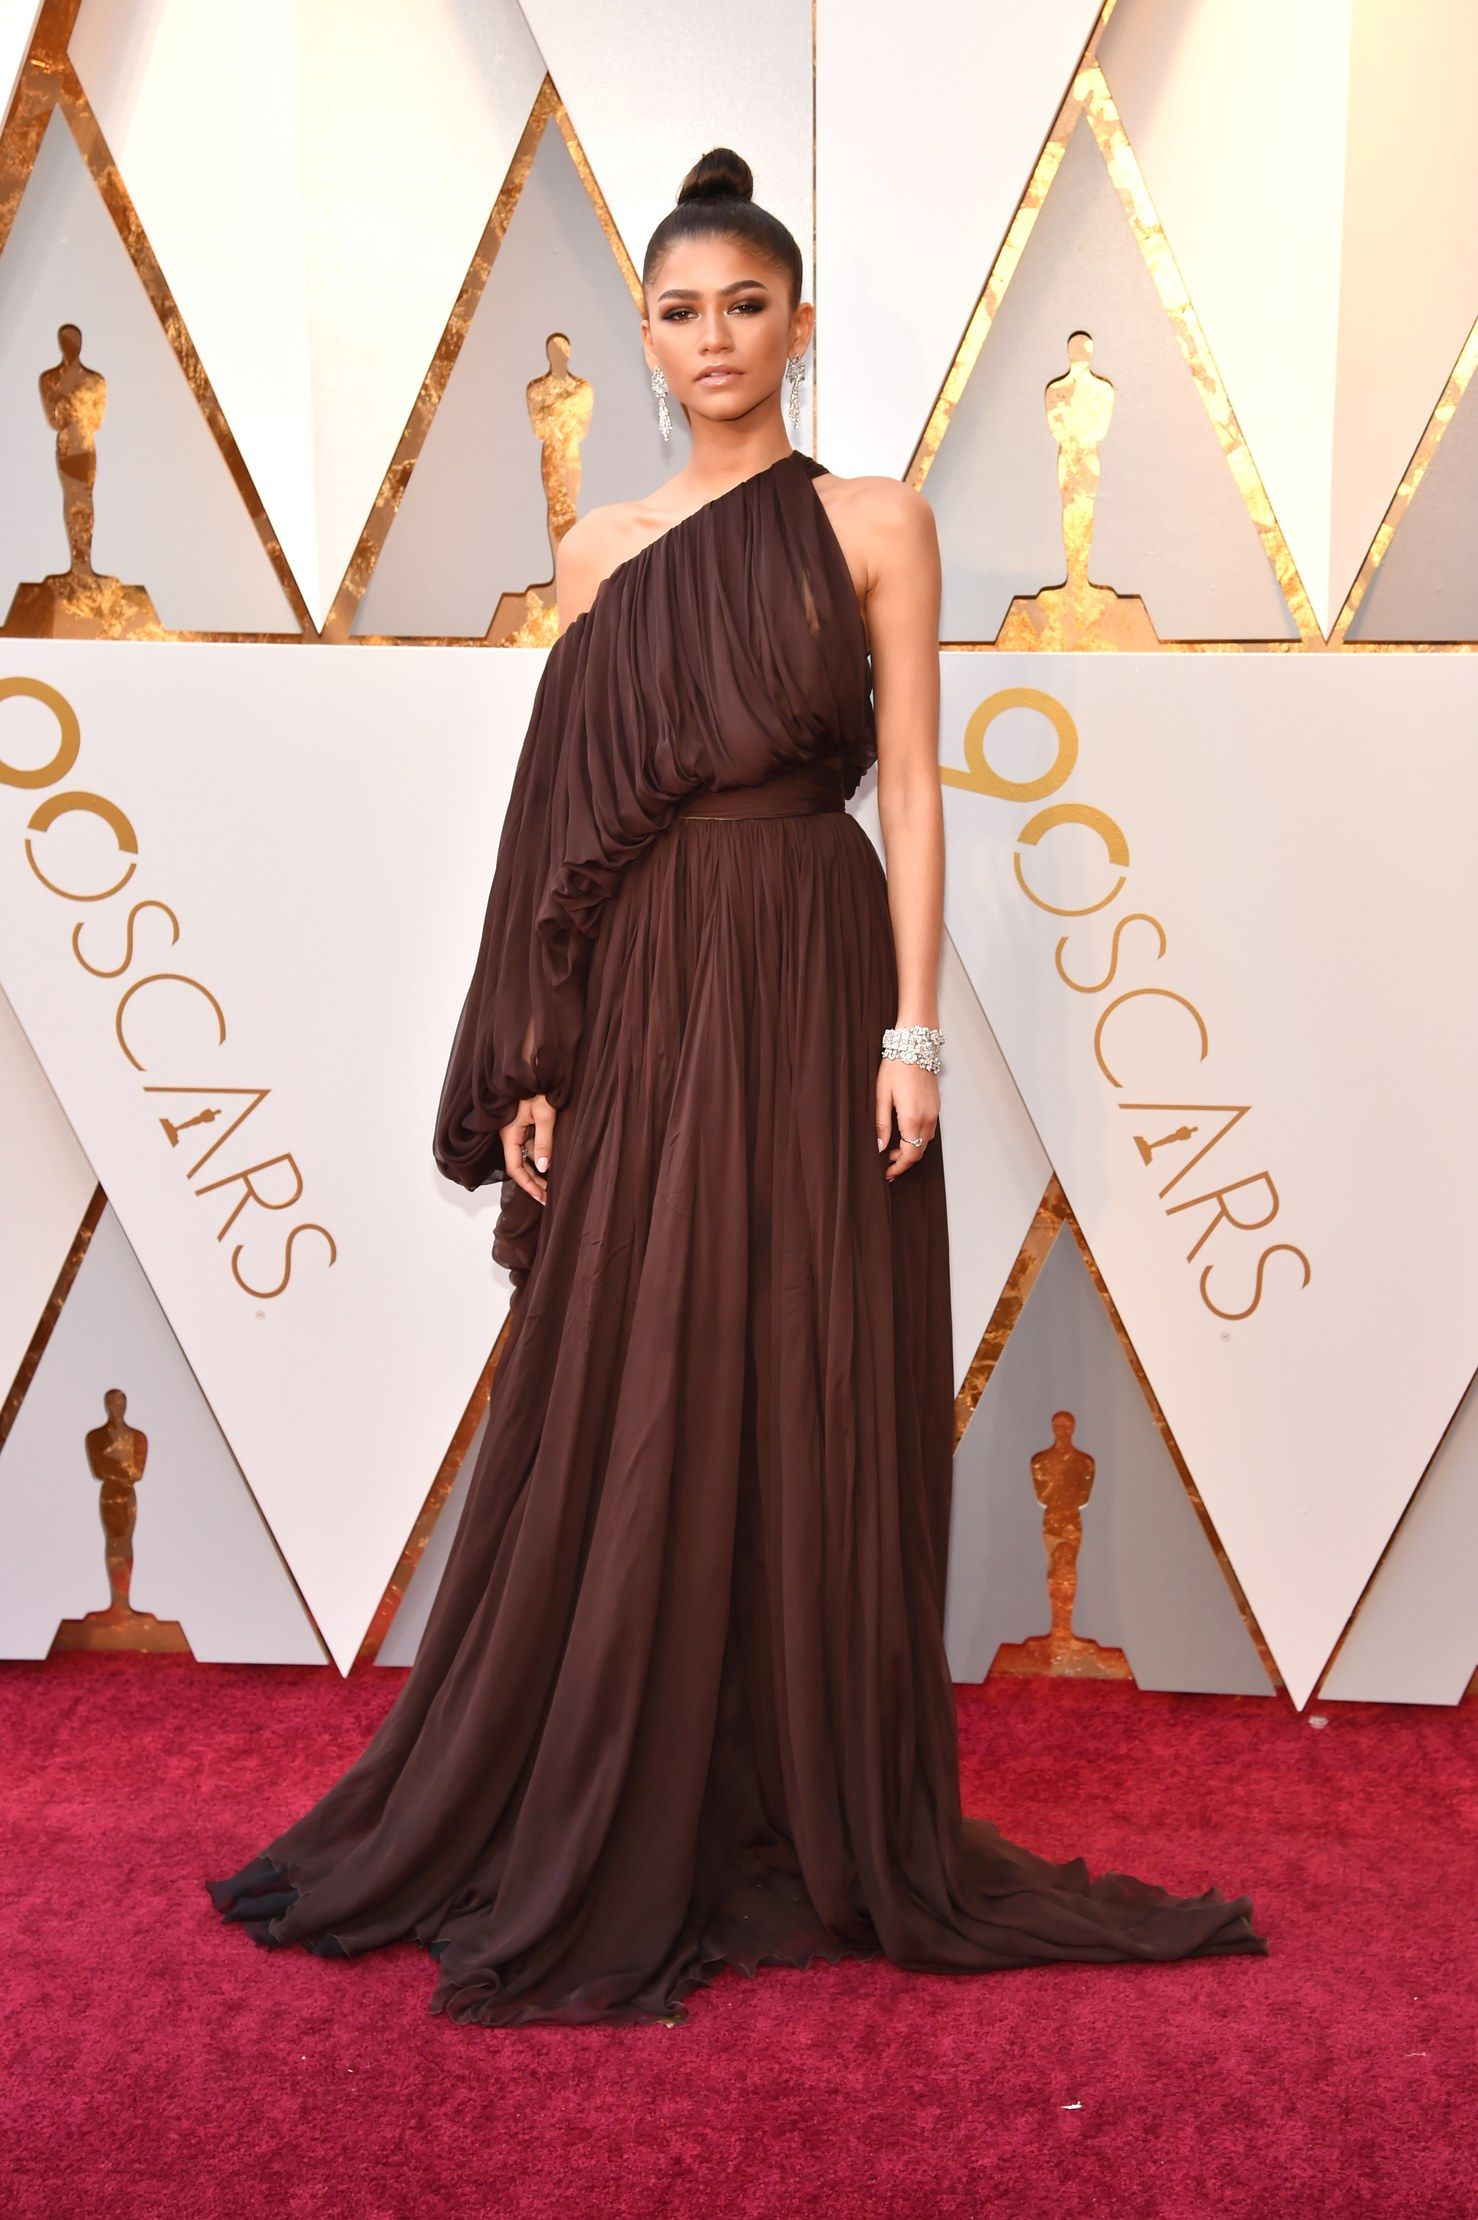 e49c55e9a09 Oscars 2018  Zendaya s Brown Off-the-Shoulder Dress at the 90th Oscars